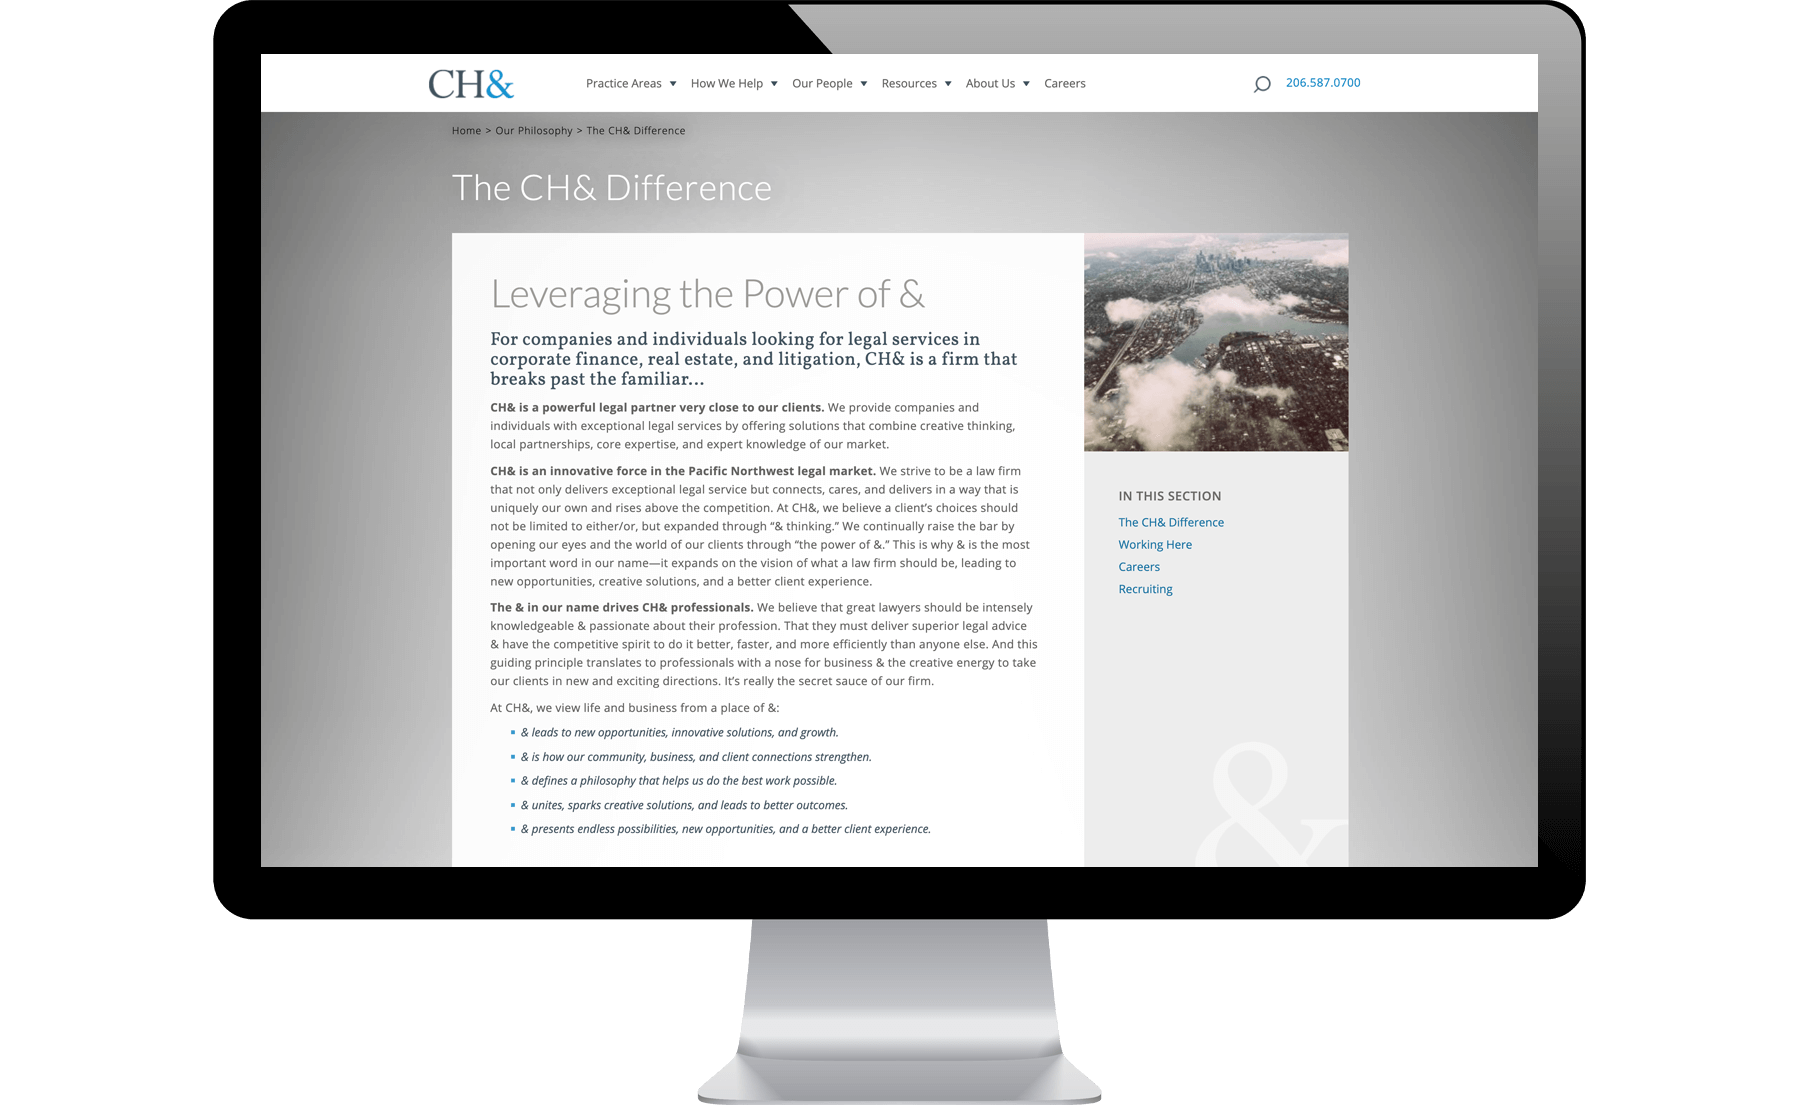 Law firm Case Study 2 – McBreen Marketing